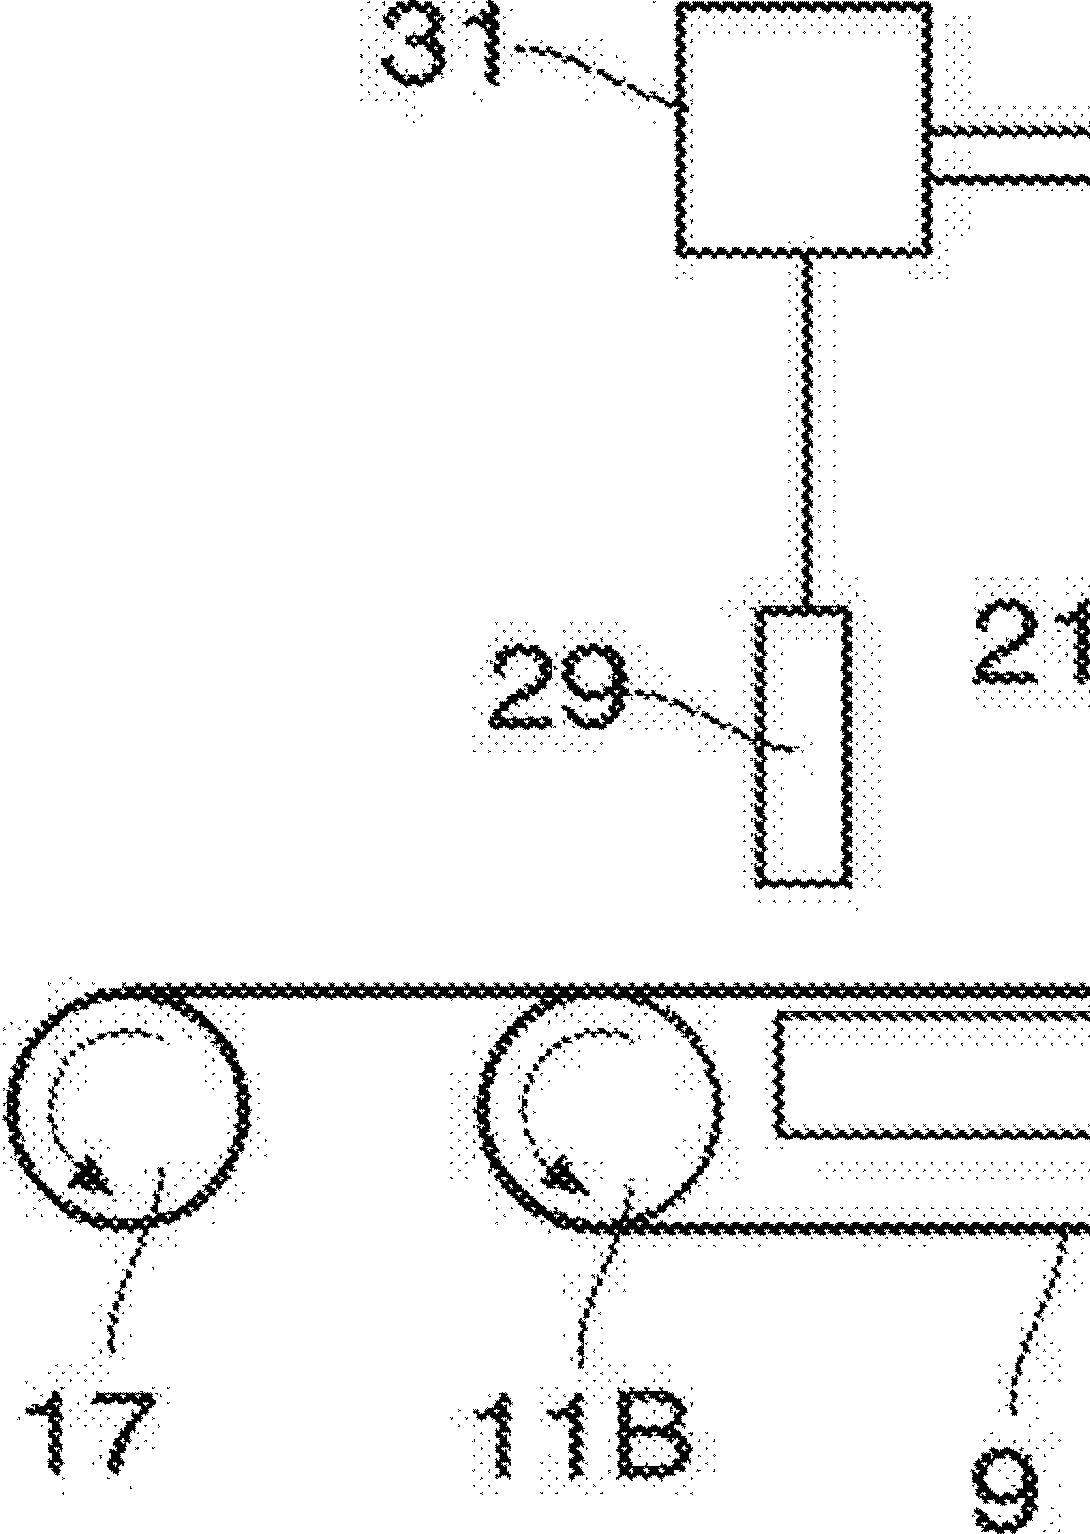 Figure GB2555125A_D0001